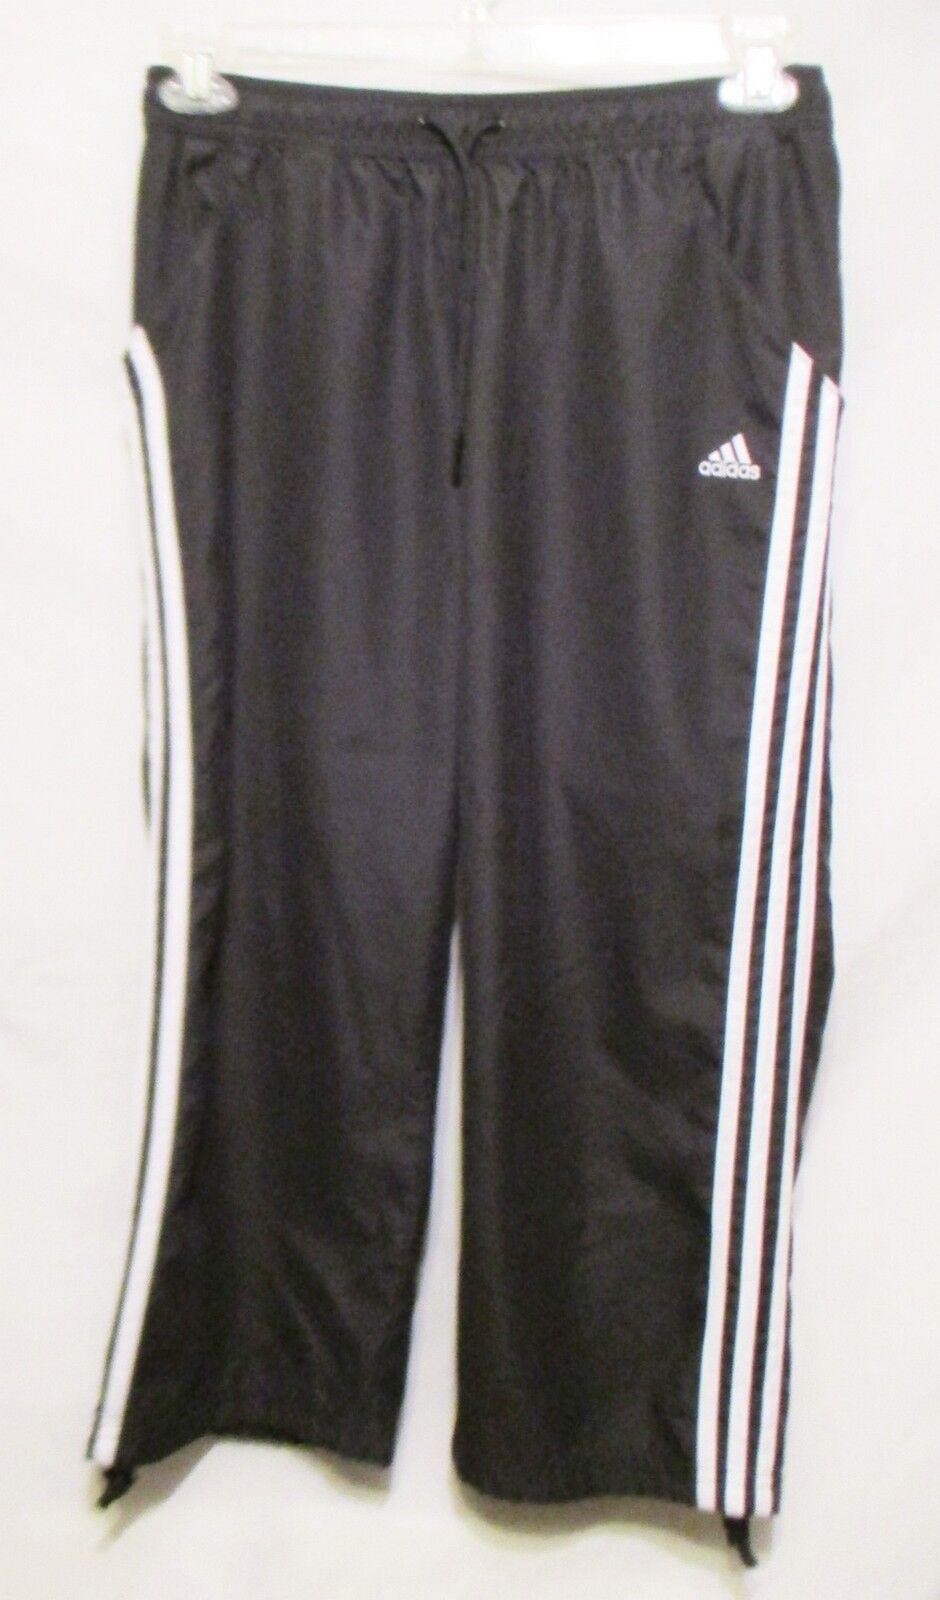 ADIDAS Pantalon de survêtement sportif pour femme, taille moyenne, noir / blanc - Tennis